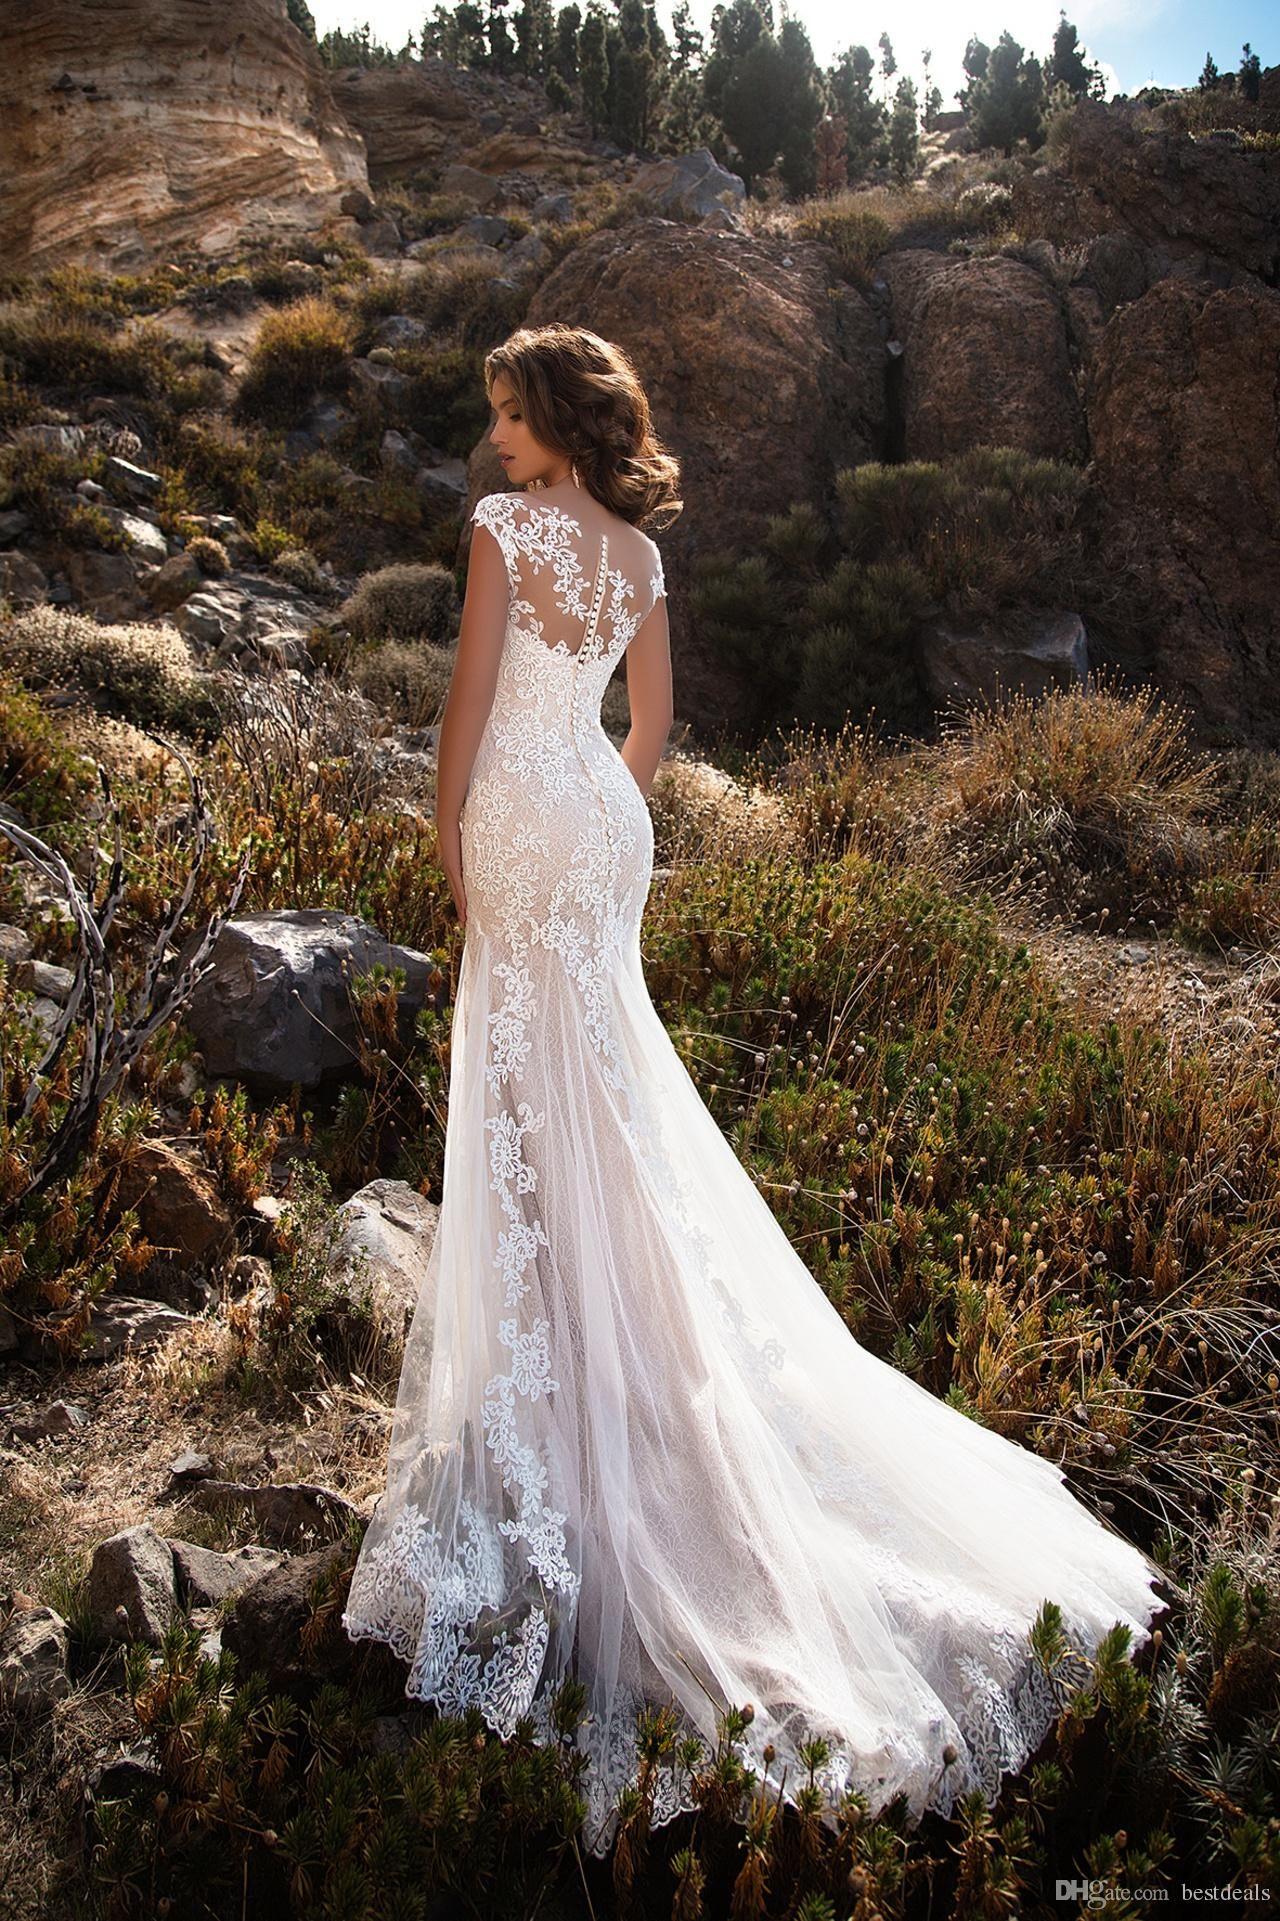 Stunning Sheer Neck Appliqued Lace Wedding Dresses 2017 Mermaid Court Train Boho Bridal Gowns Vestidos De Noiva Discount Wedding Gowns Lace Bridal Dresses From Bestdeals, $169.43| DHgate.Com